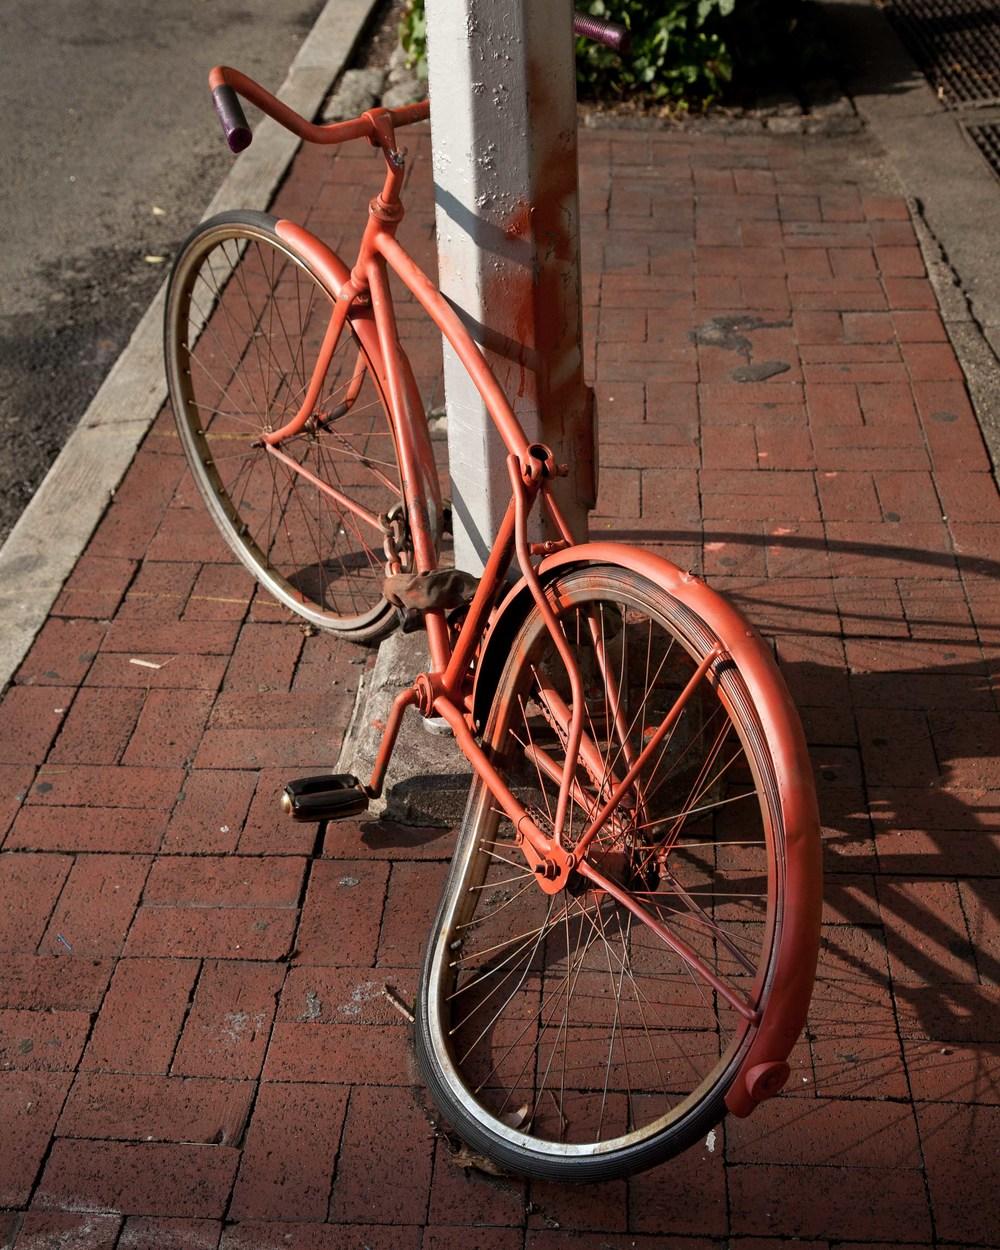 Bikescapes-14.jpg